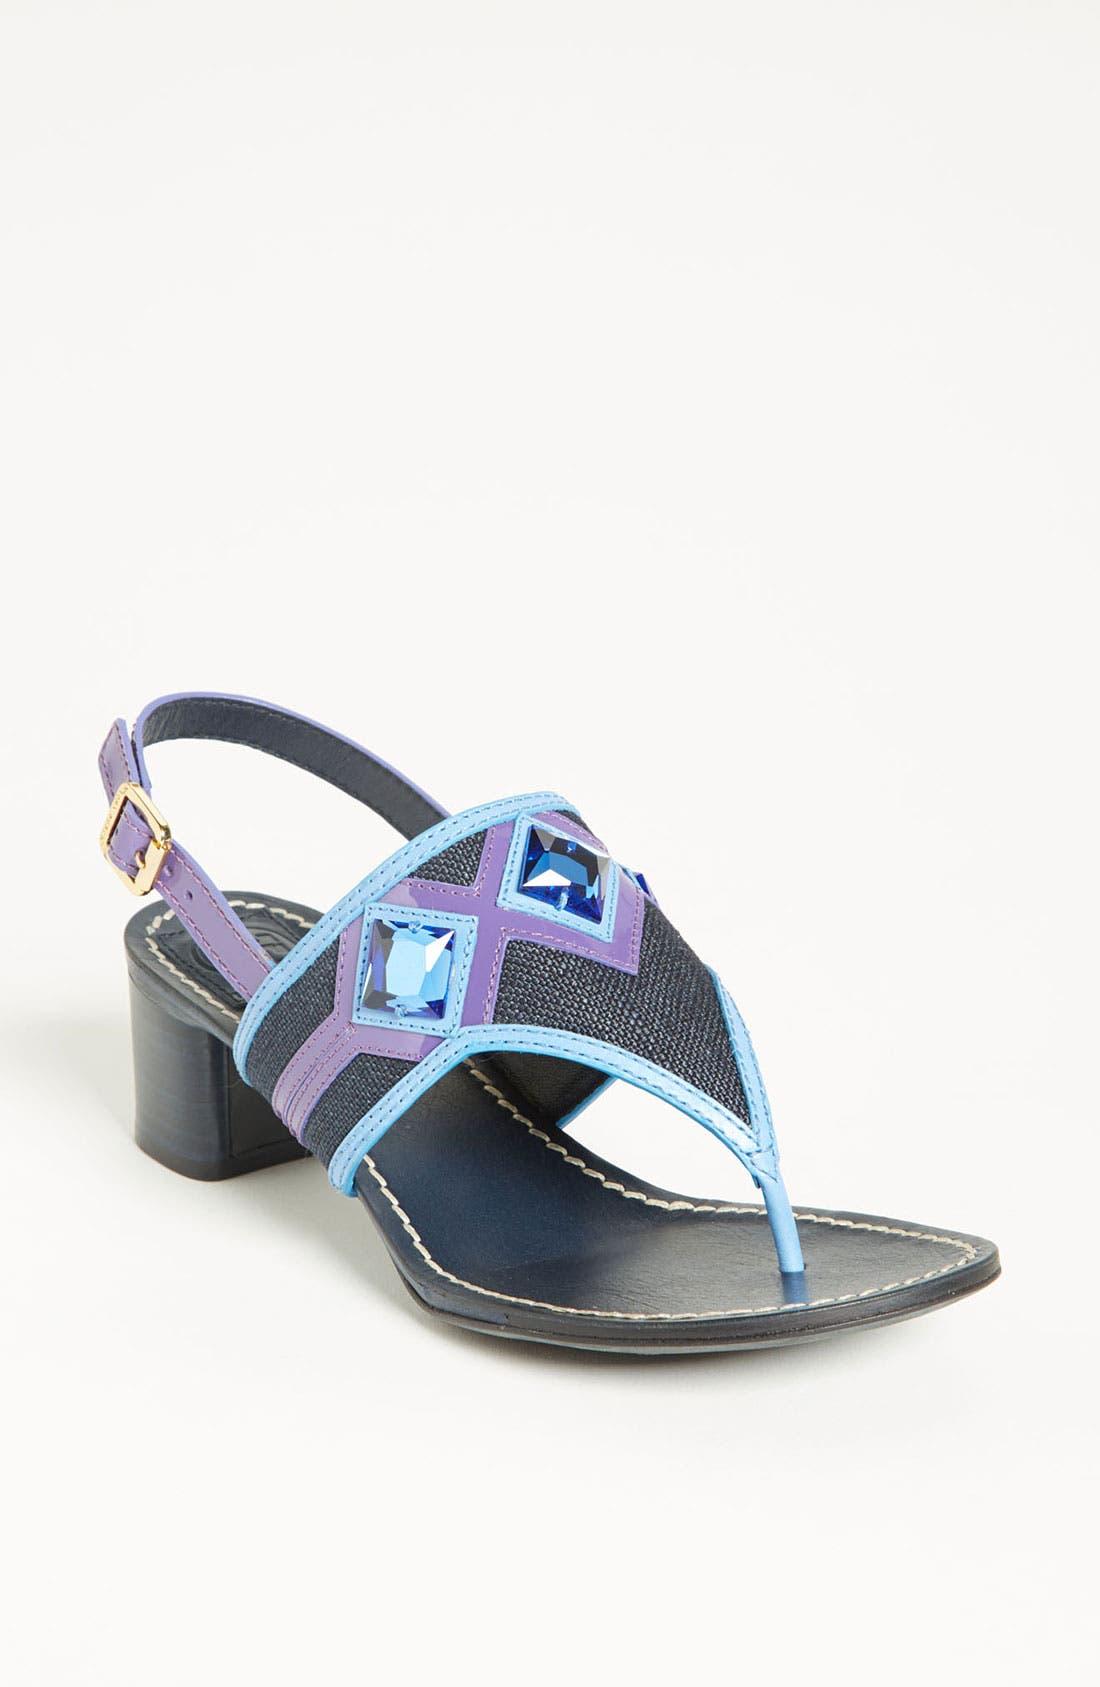 Main Image - Tory Burch 'Etta' Sandal